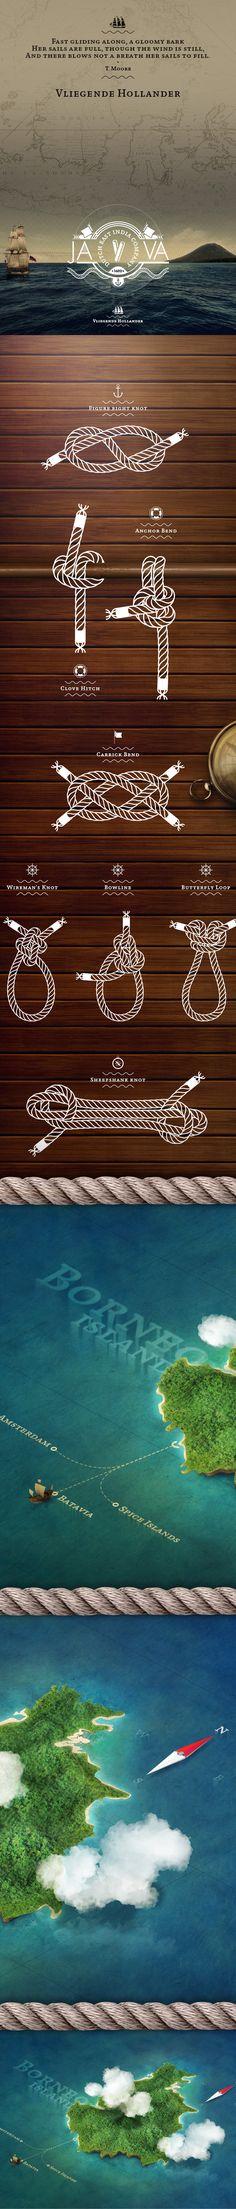 Vliegende Hollander by Alessandro Suraci, via #Behance #Design